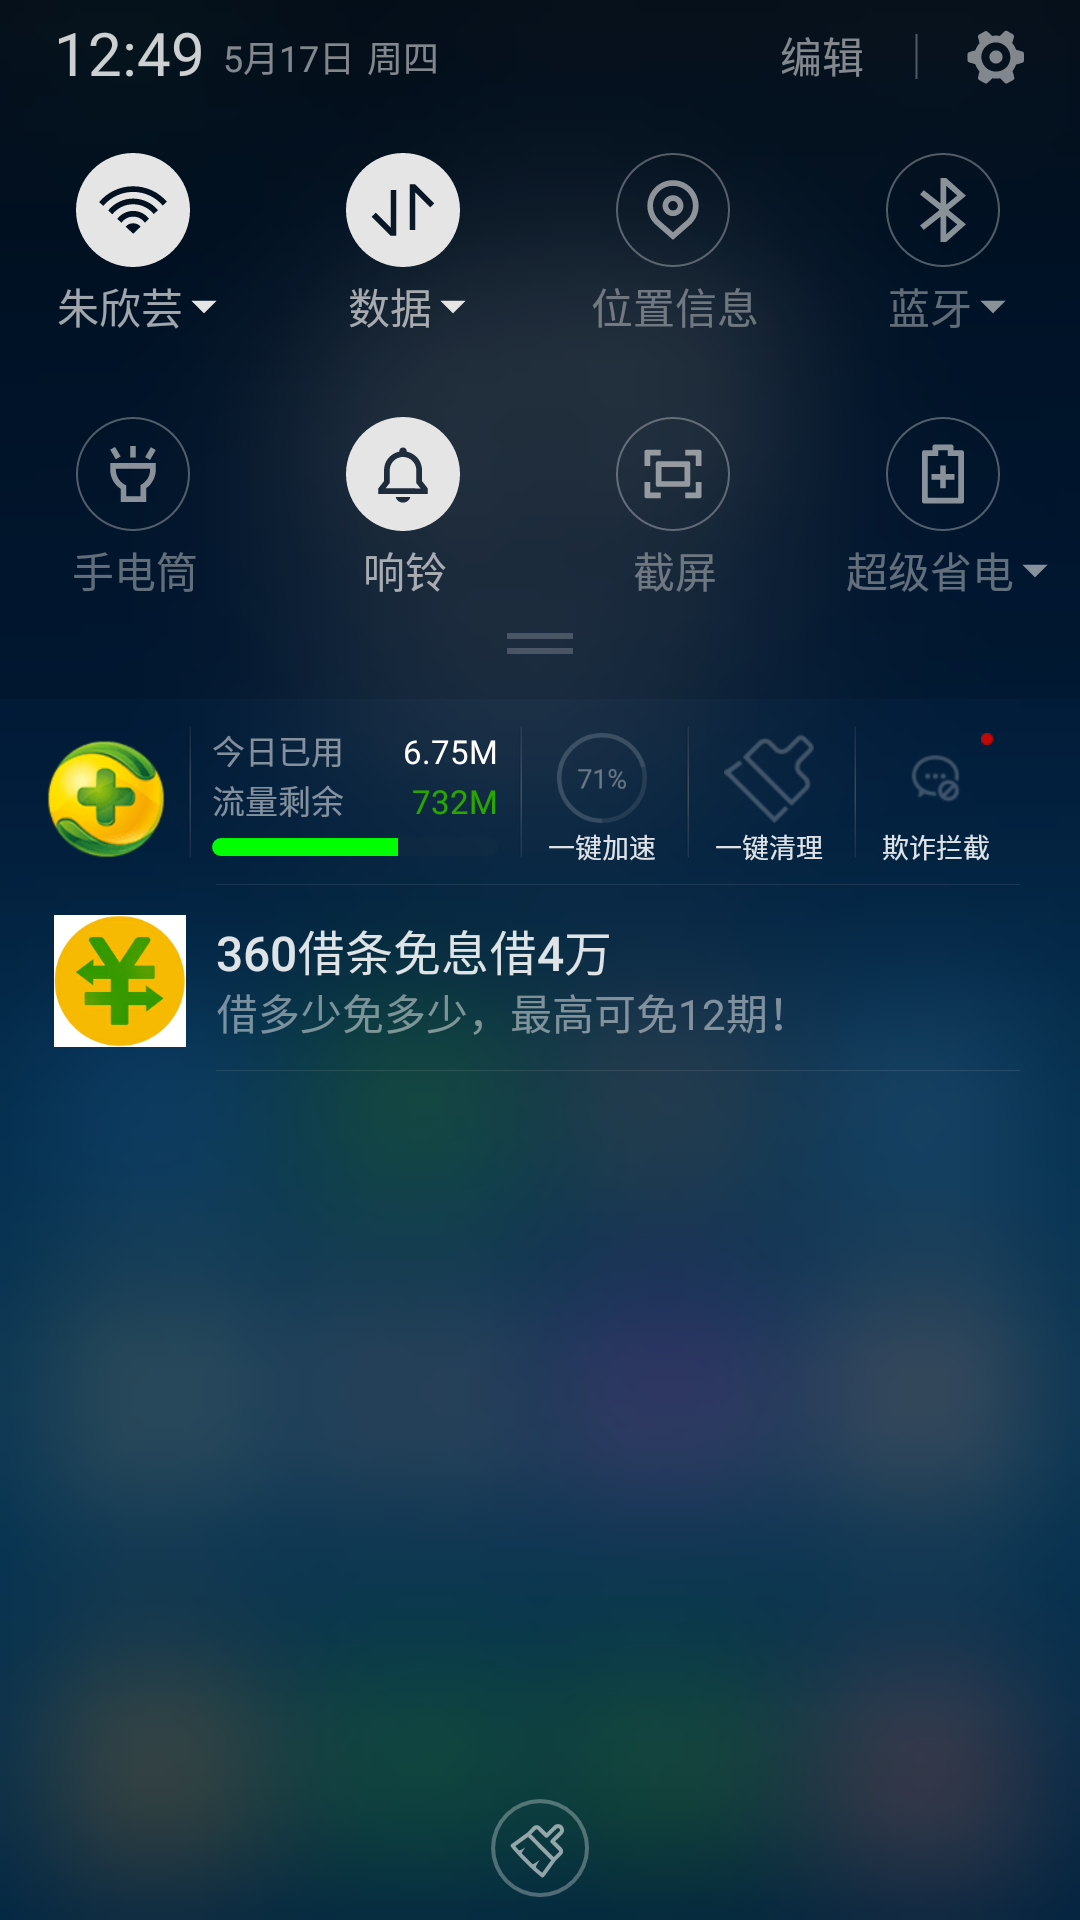 Screenshot_2018-05-17-12-49-39.png